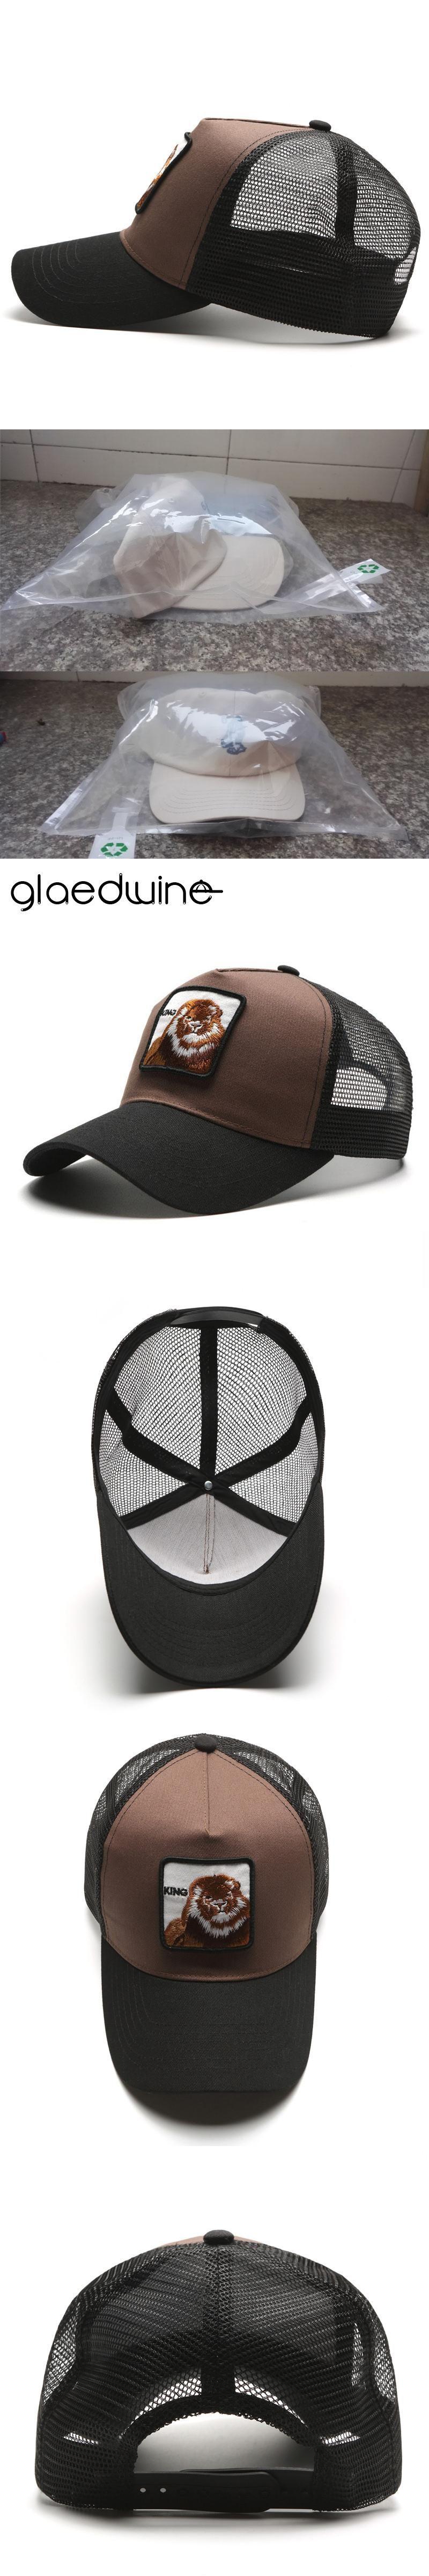 Glaedwine 2017 snapback trucker mesh cap women baseball cap men women  casquette gorras planas King snapback caps dad hat for men 7532b550b1a